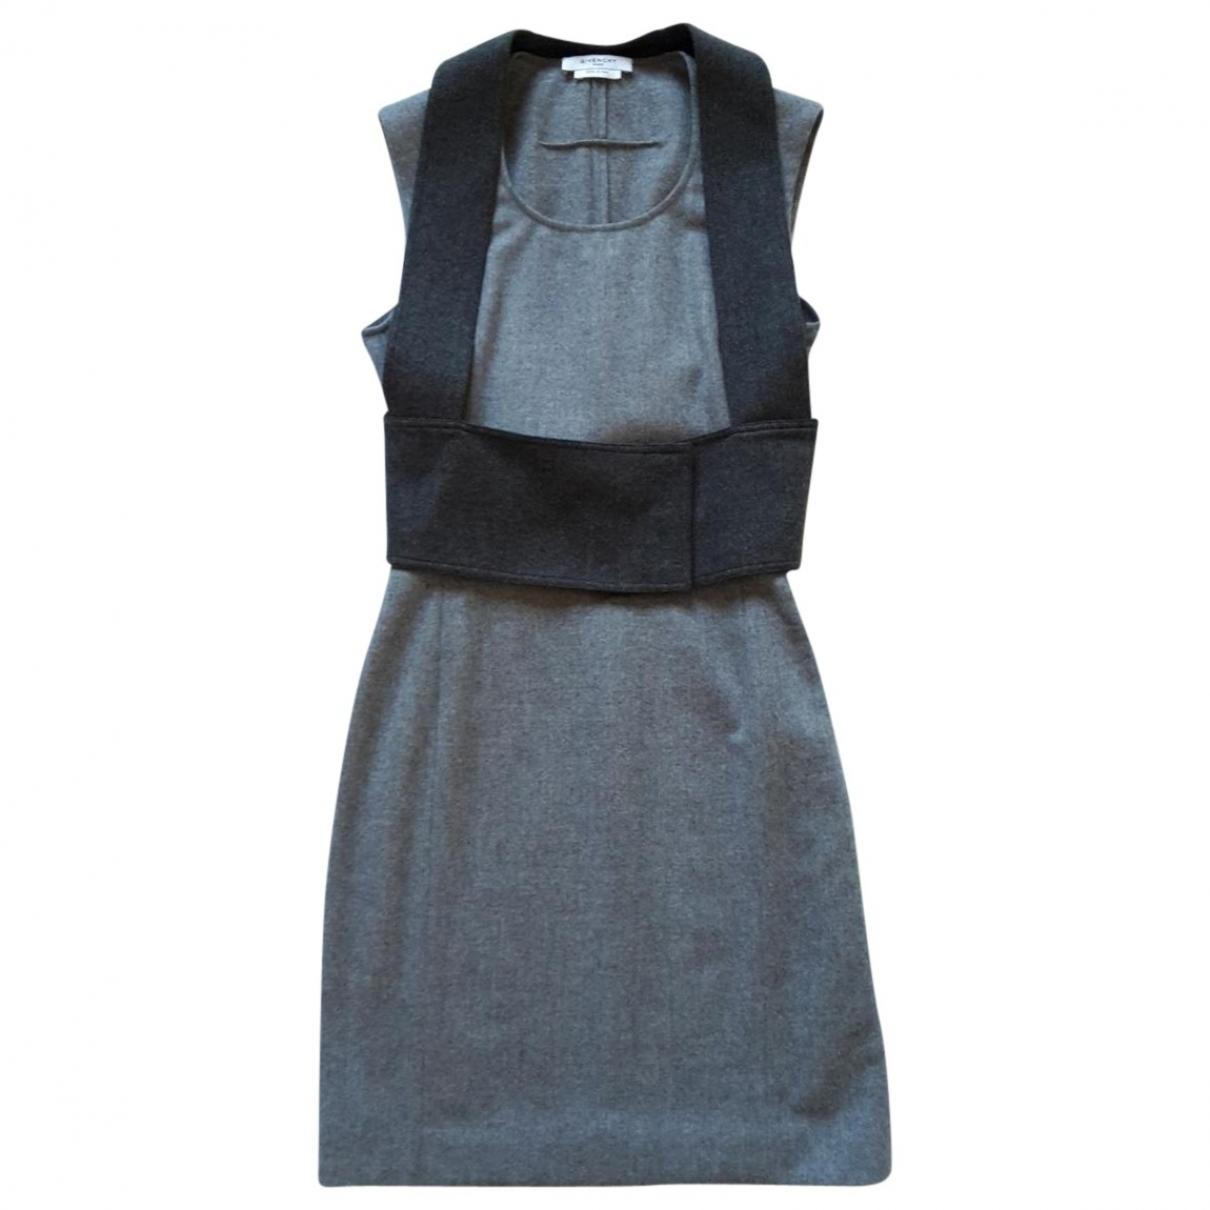 Givenchy \N Kleid in  Grau Wolle